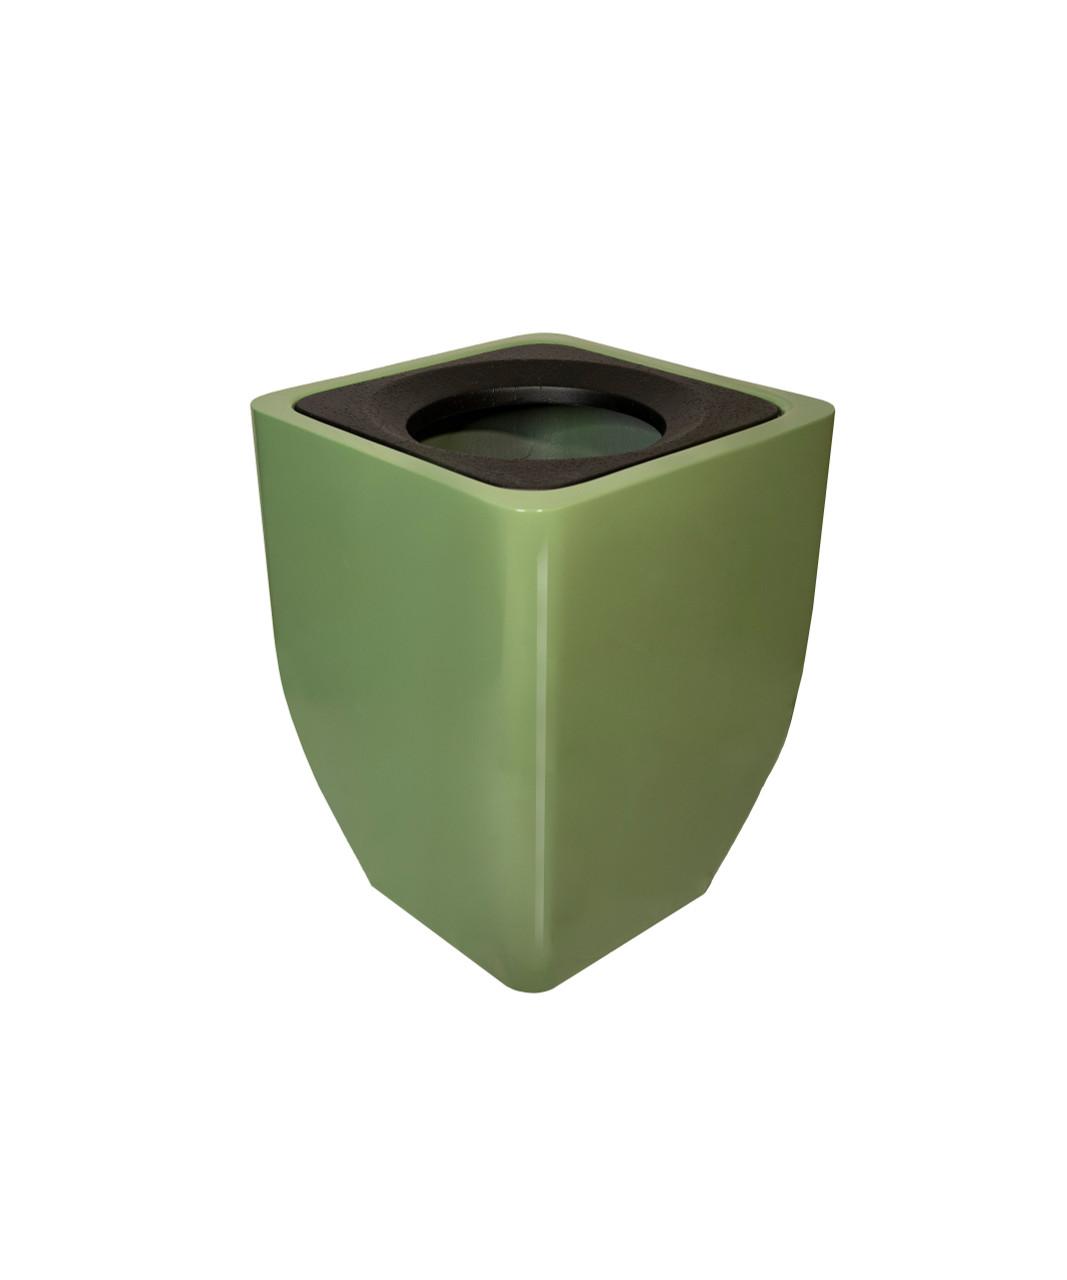 40 Gallon Fiberglass OXFORD Decorative Trash Receptacle